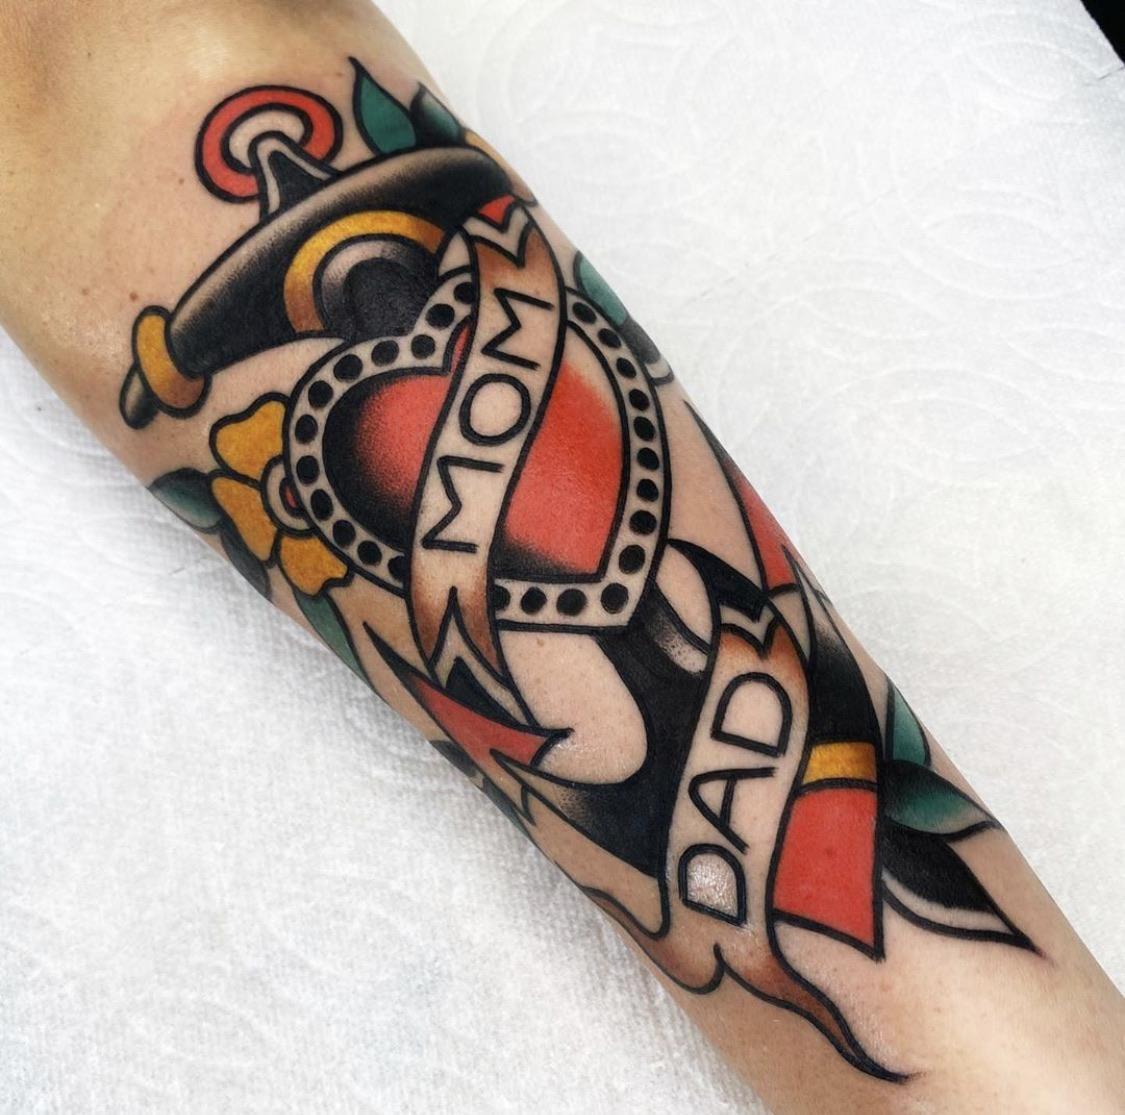 Fam bam. By Derek Sayeg at Genuine Electric Tattoo in LA